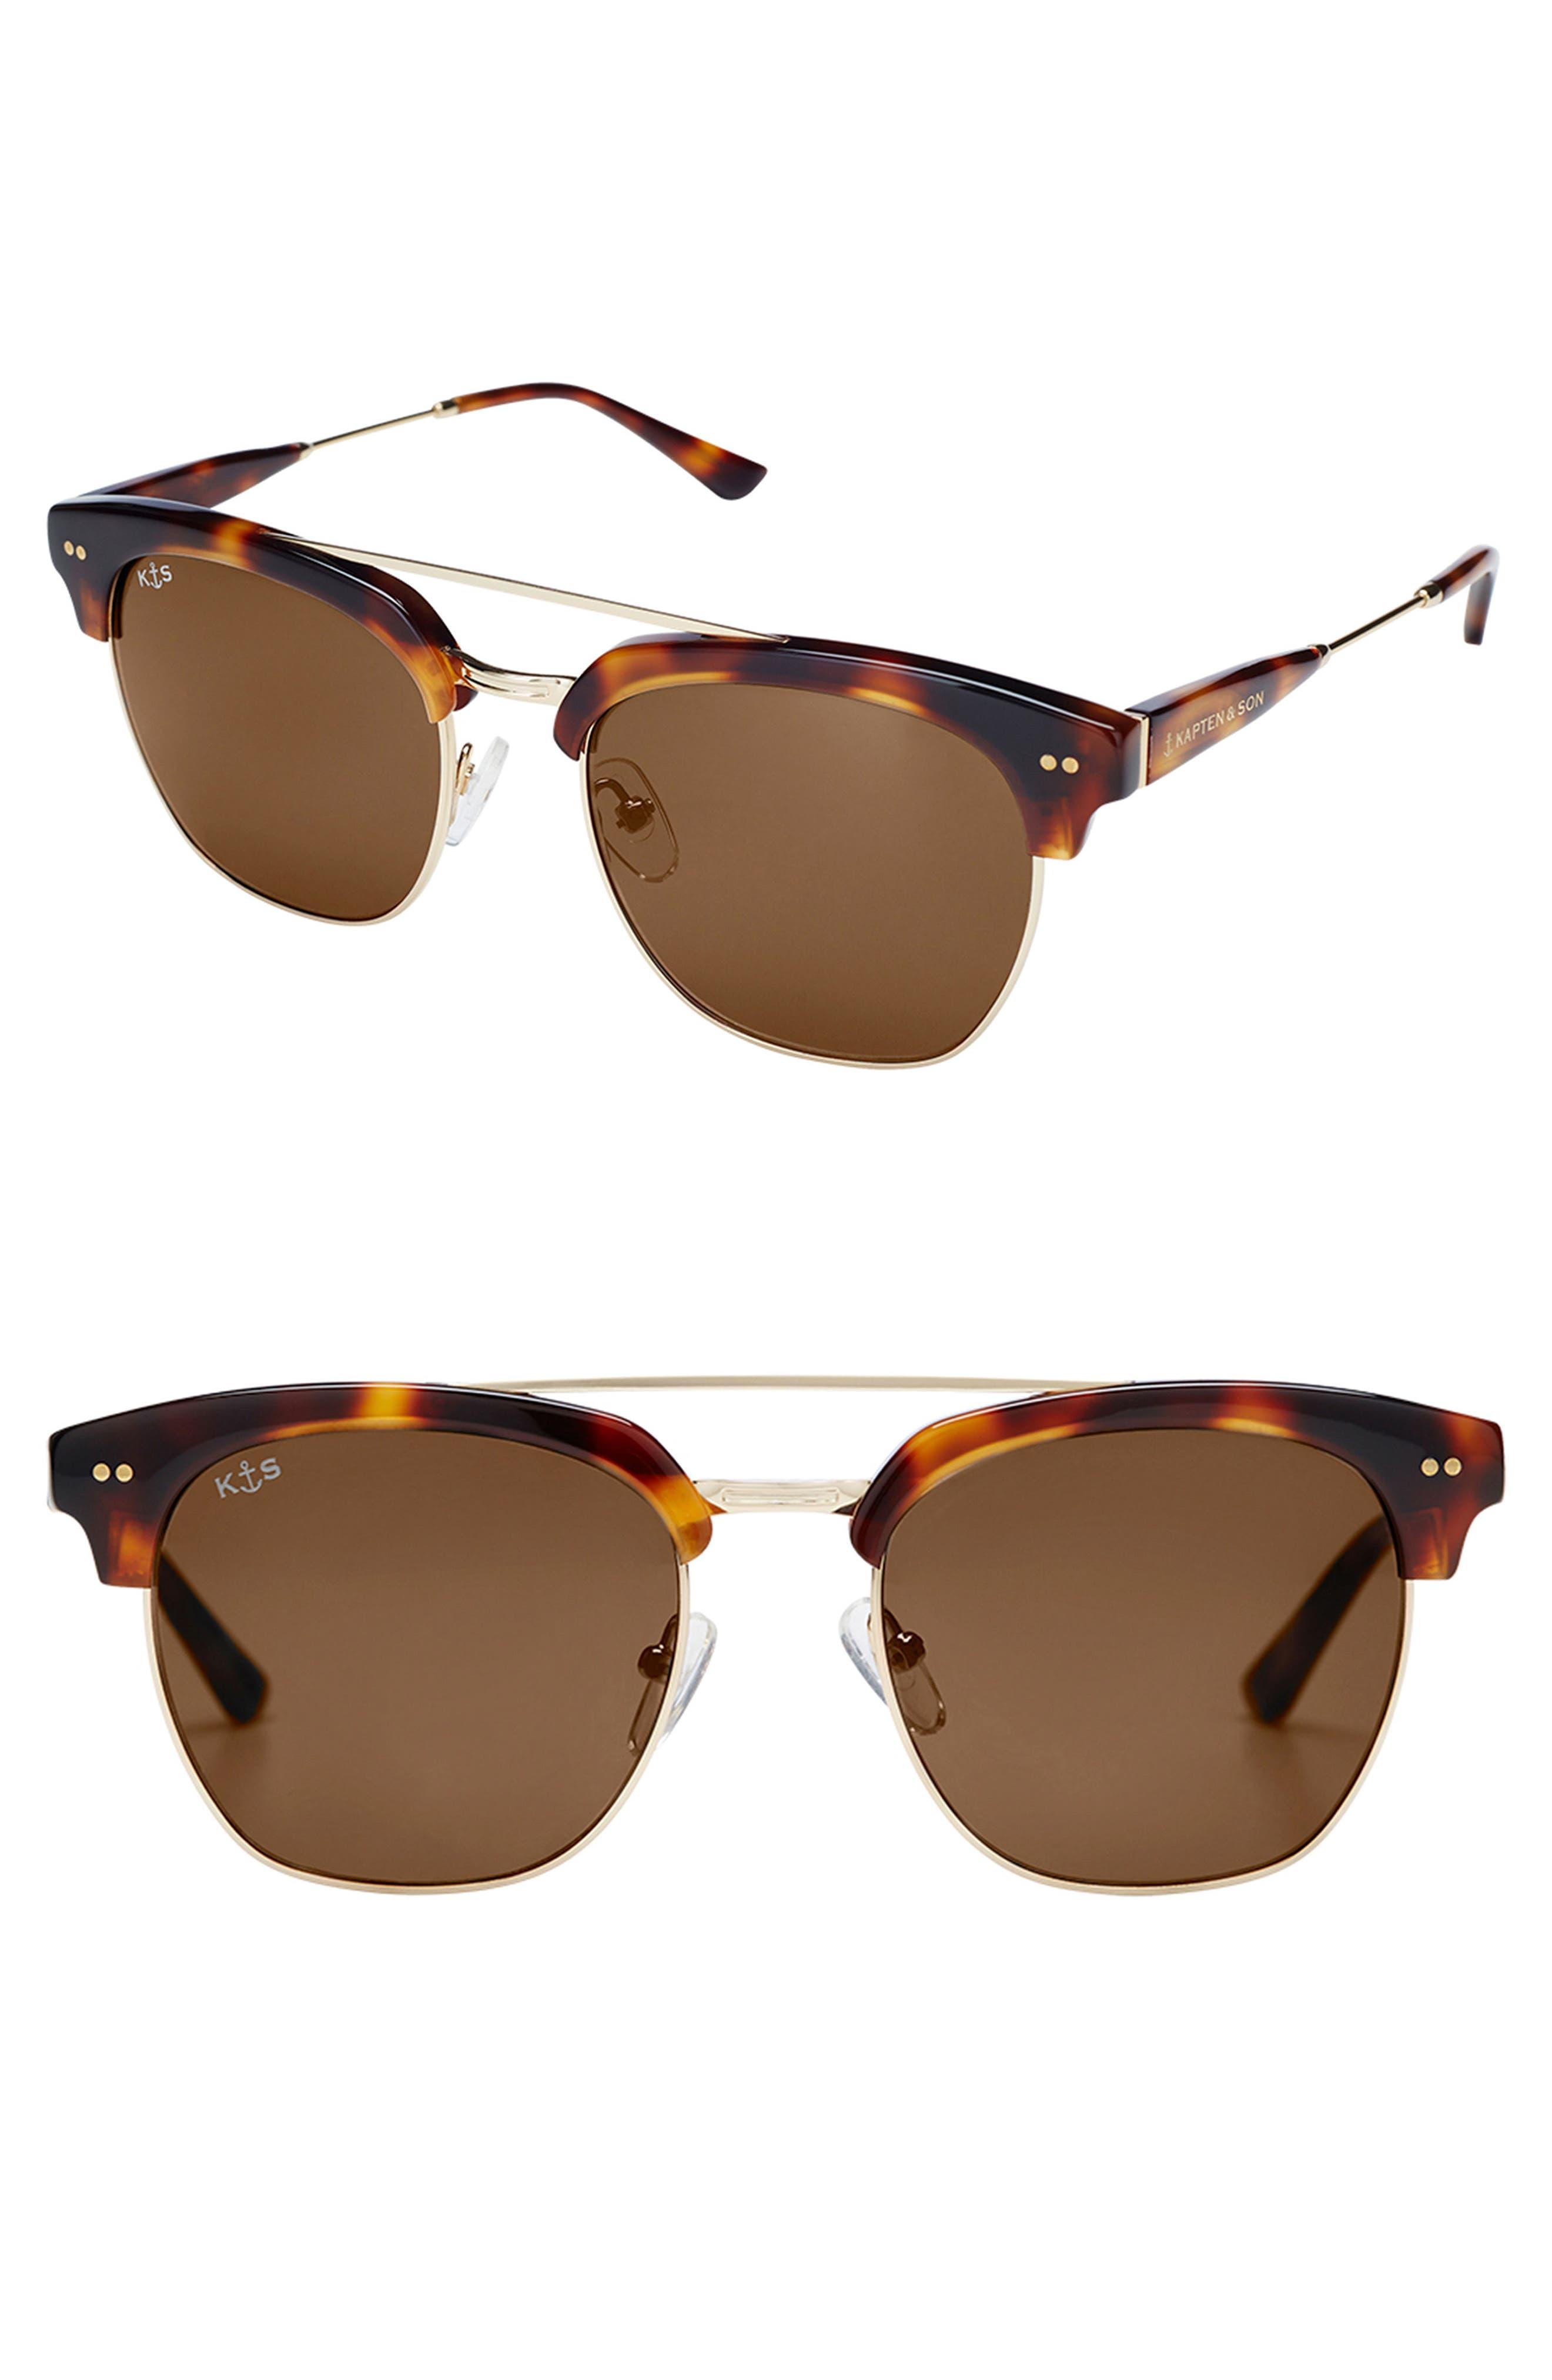 Havana 50mm Sunglasses,                             Main thumbnail 1, color,                             TORTOISE/ GRADIENT BROWN